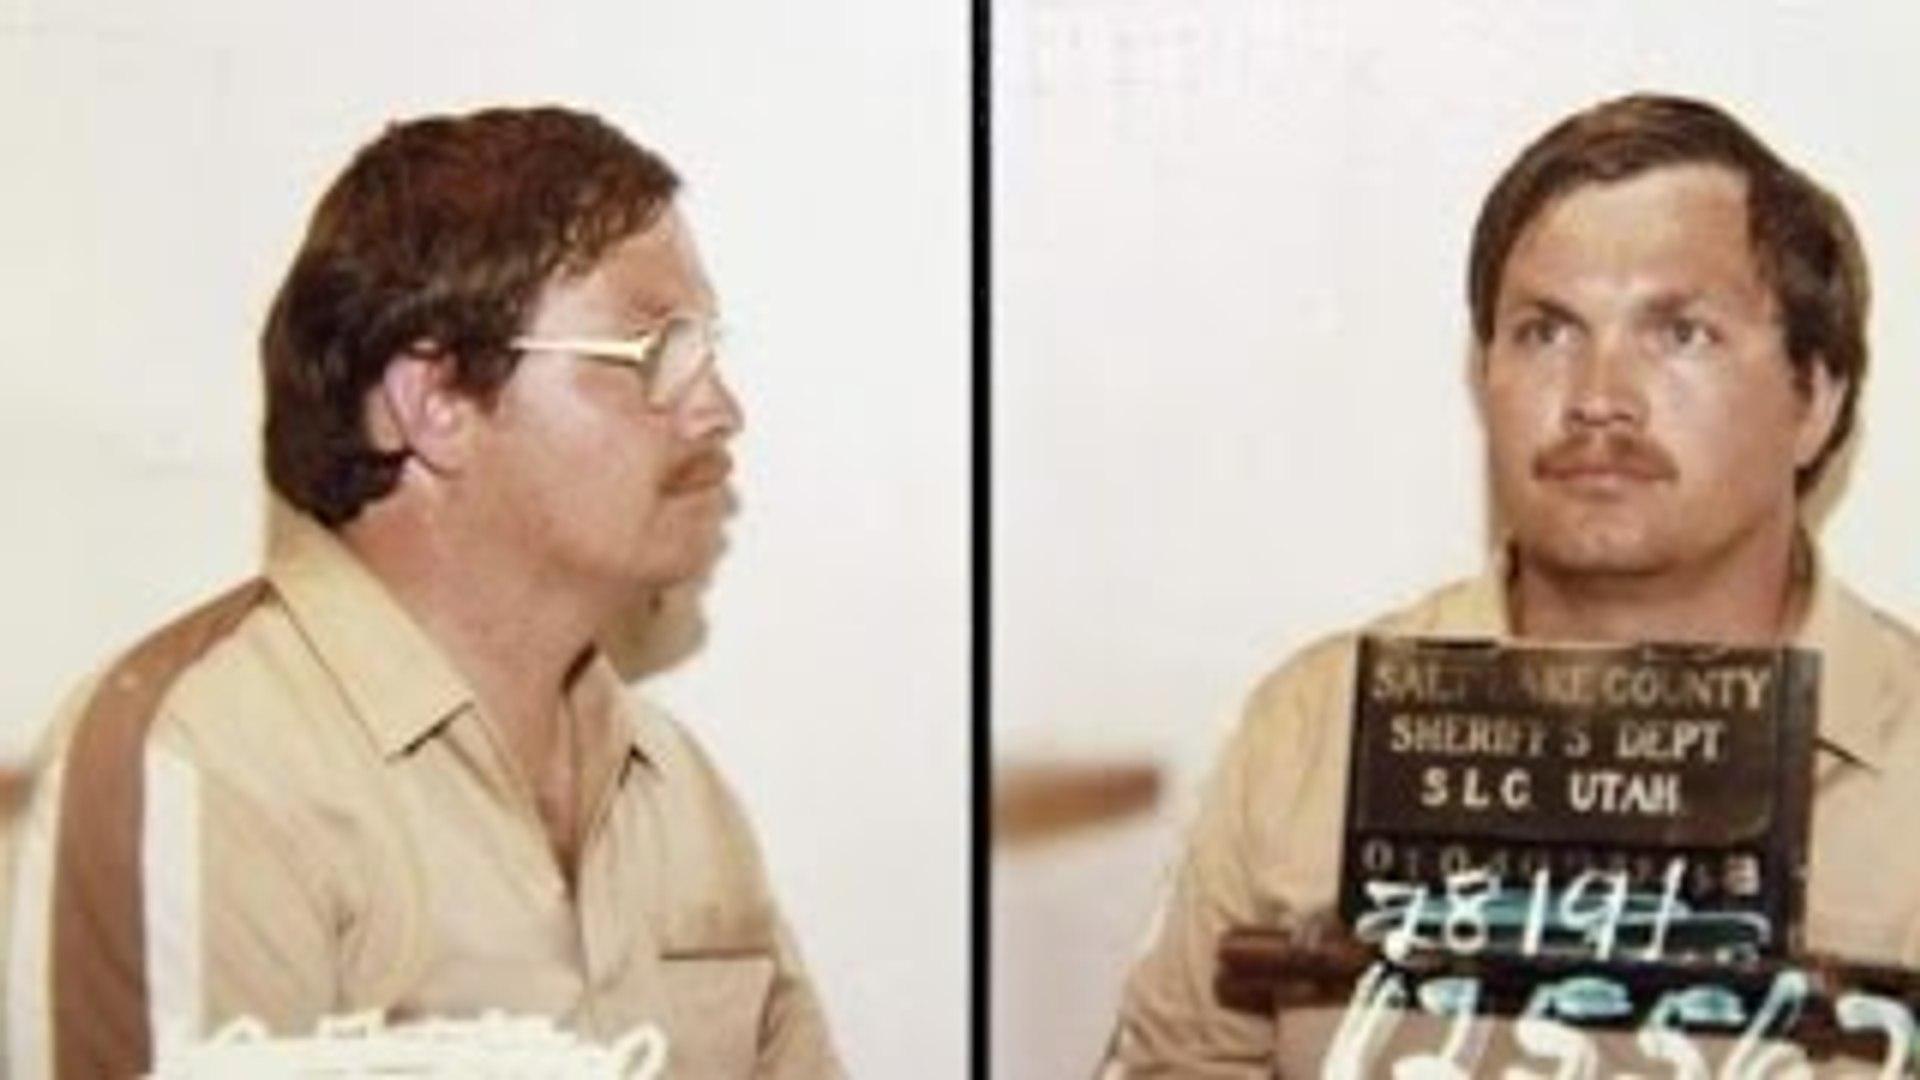 Arthur Gary Bishop, Roger Downs - Lynn Jones : Serial Killer Documentary